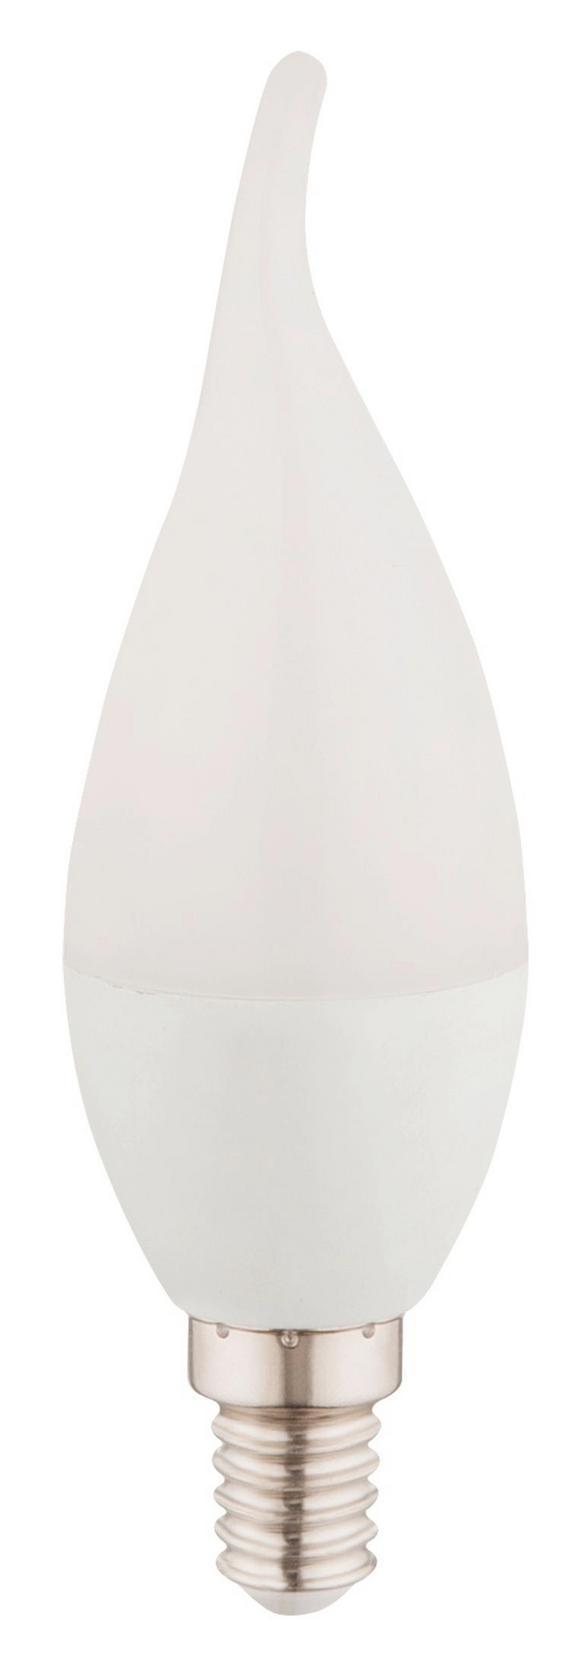 LED-Leuchtmittel 10604w-2, max. 3 Watt - Opal, Kunststoff/Metall (3,7/12,3cm)